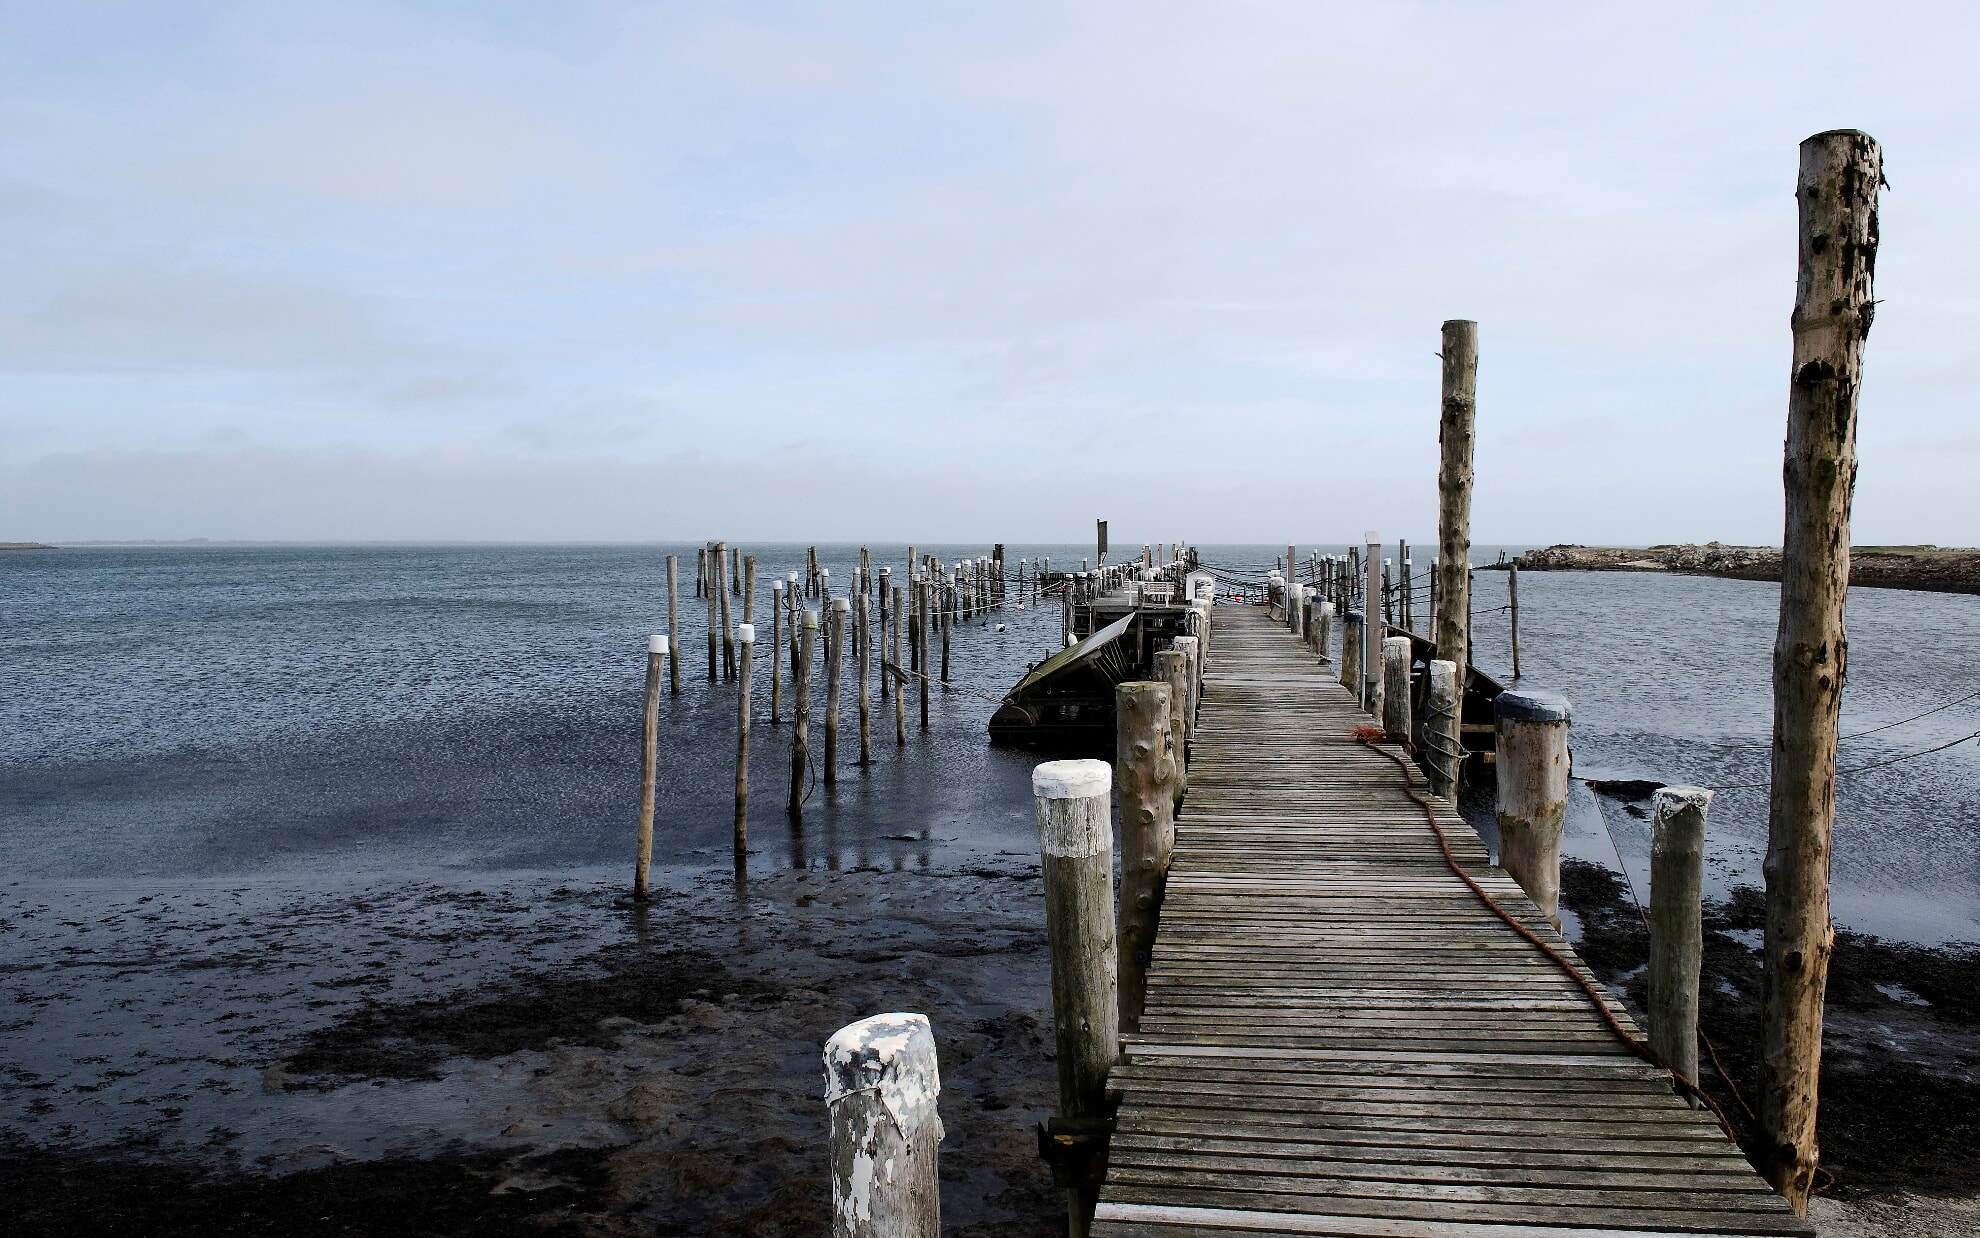 Hafen in Rantum